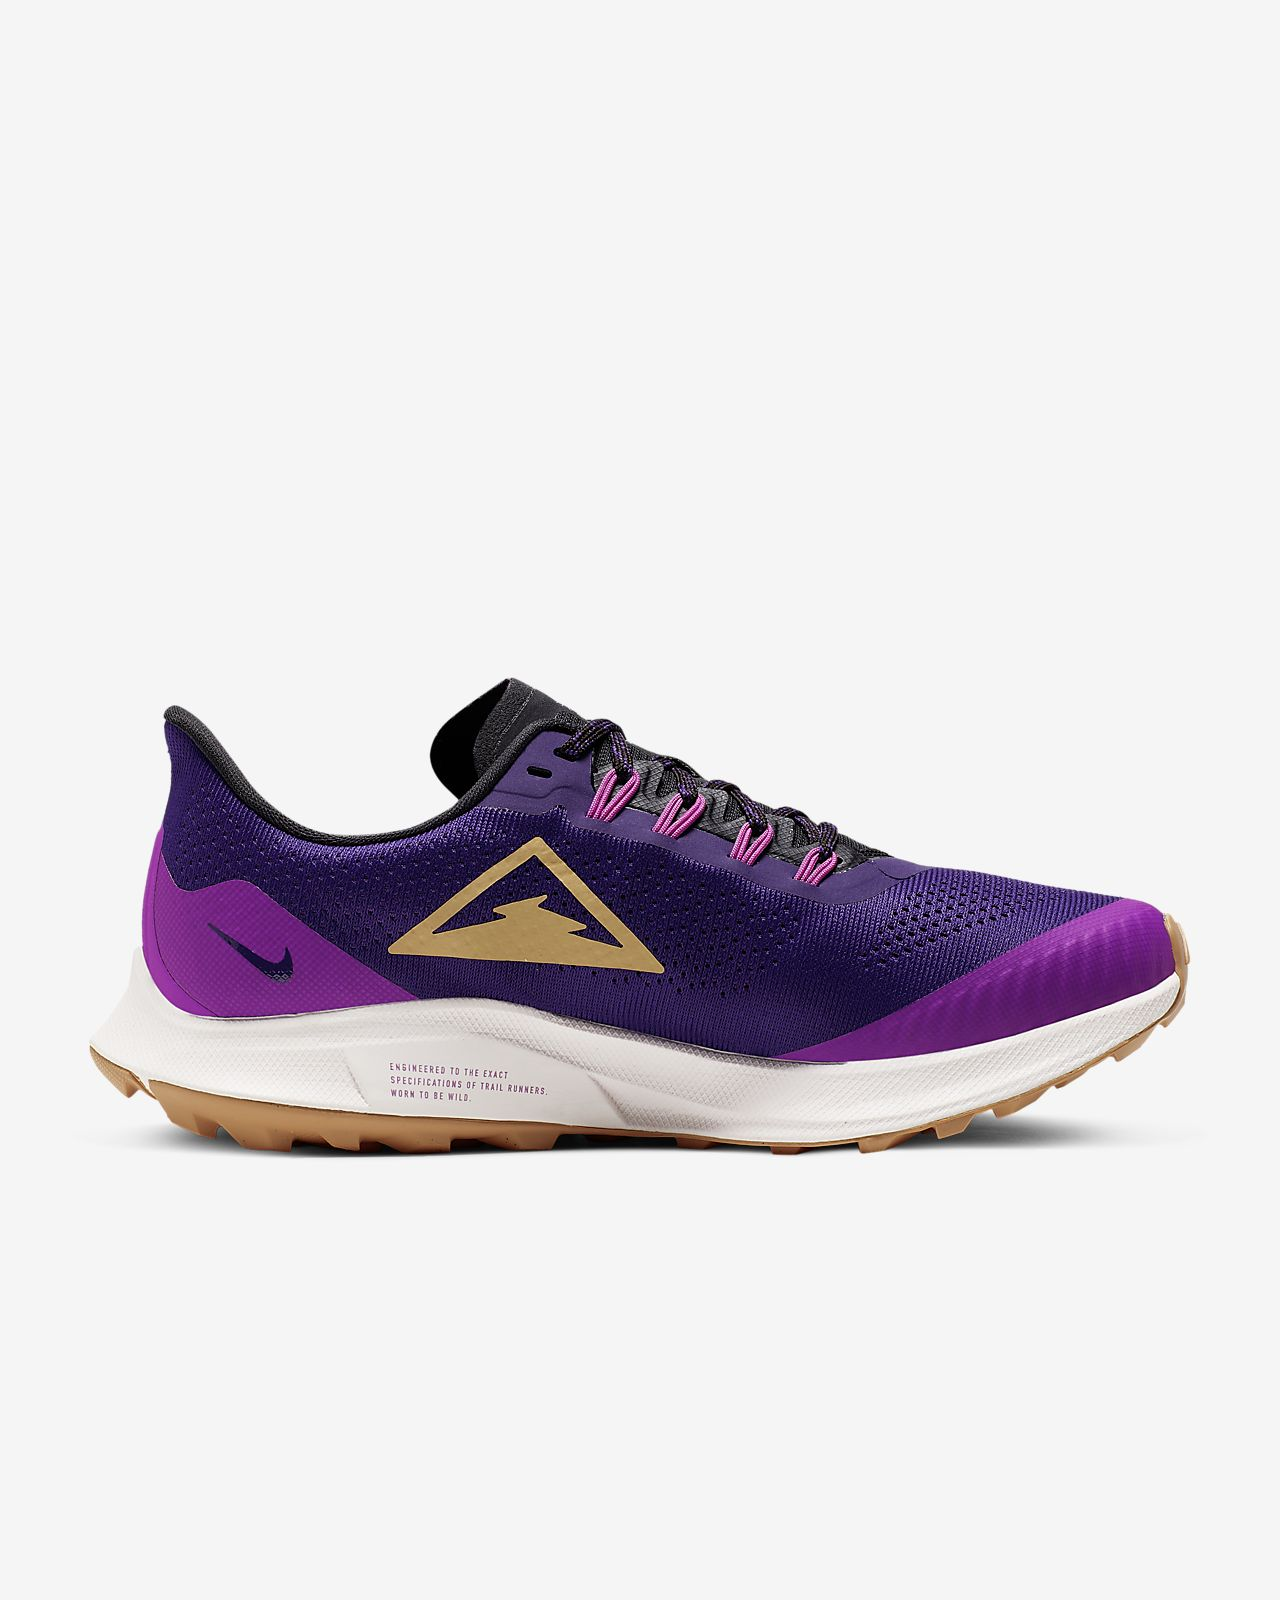 ecbe7e33814 Nike Air Zoom Pegasus 36 Trail Zapatillas de running - Mujer. Nike ...